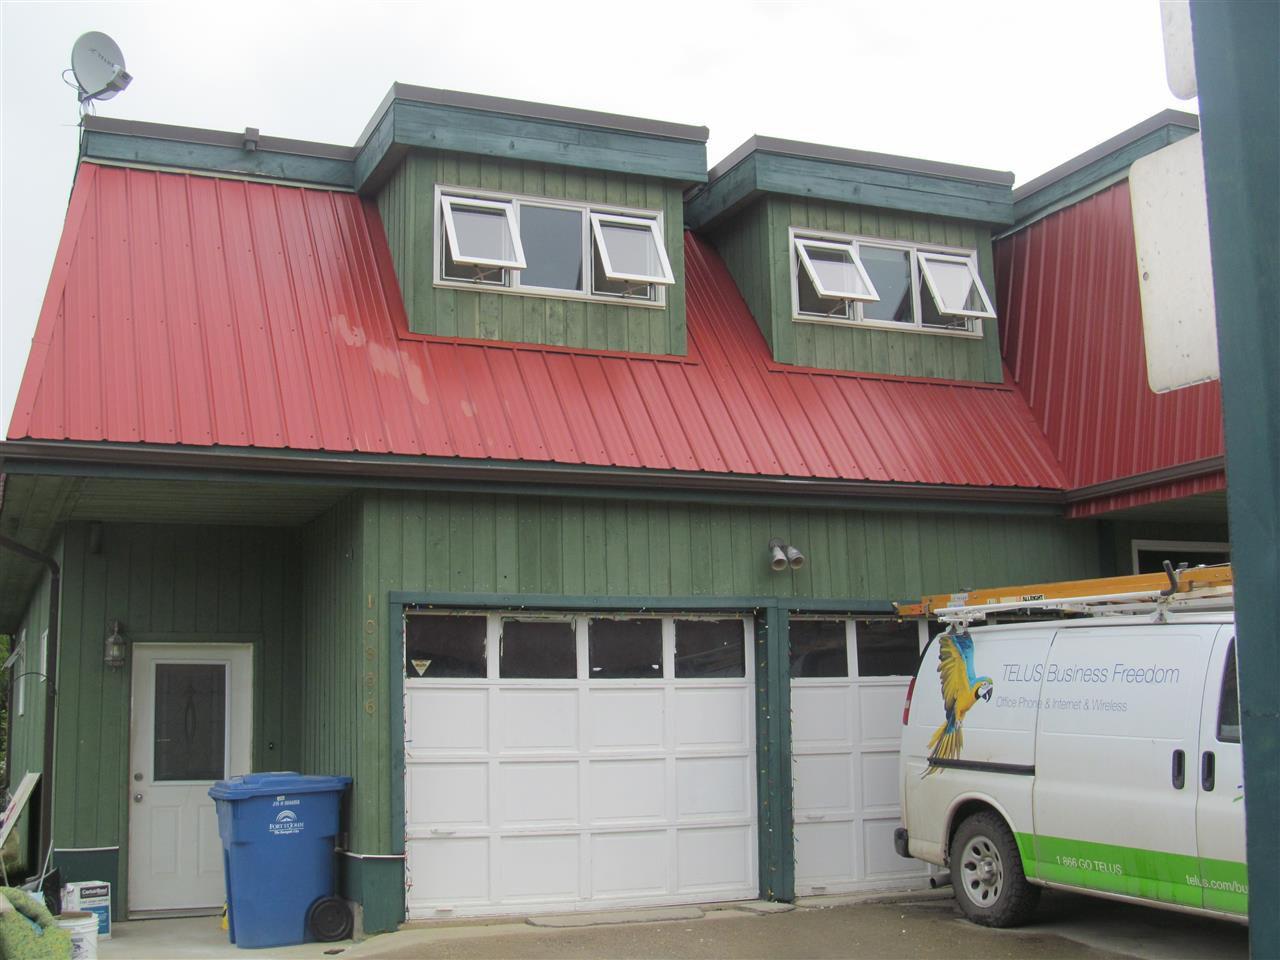 "Main Photo: 10836 102 Street in Fort St. John: Fort St. John - City NW Townhouse for sale in ""CEDAR VILLAGE"" (Fort St. John (Zone 60))  : MLS®# R2373267"